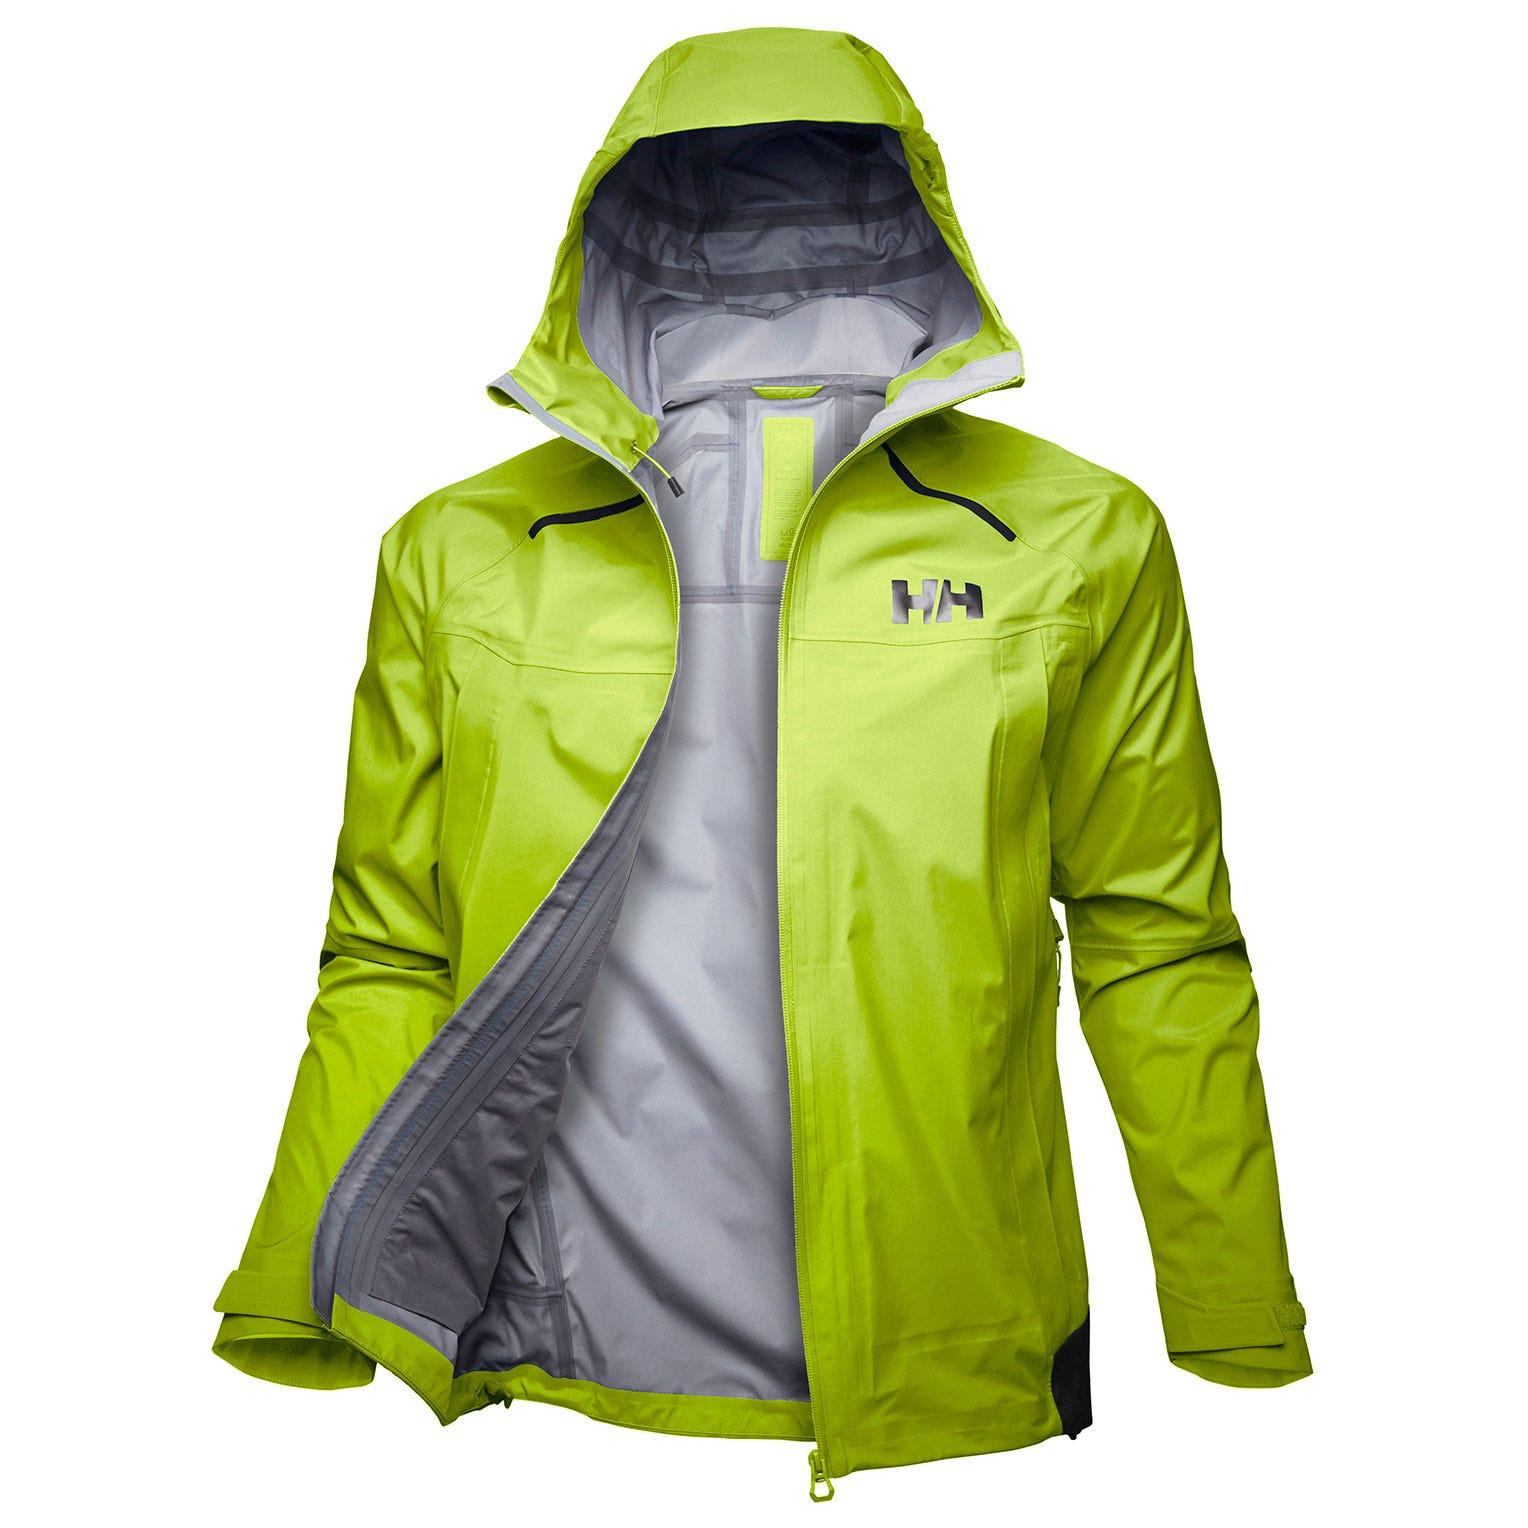 Helly Hansen Odin 9 Worlds Jacket Mens Hiking Yellow XXL